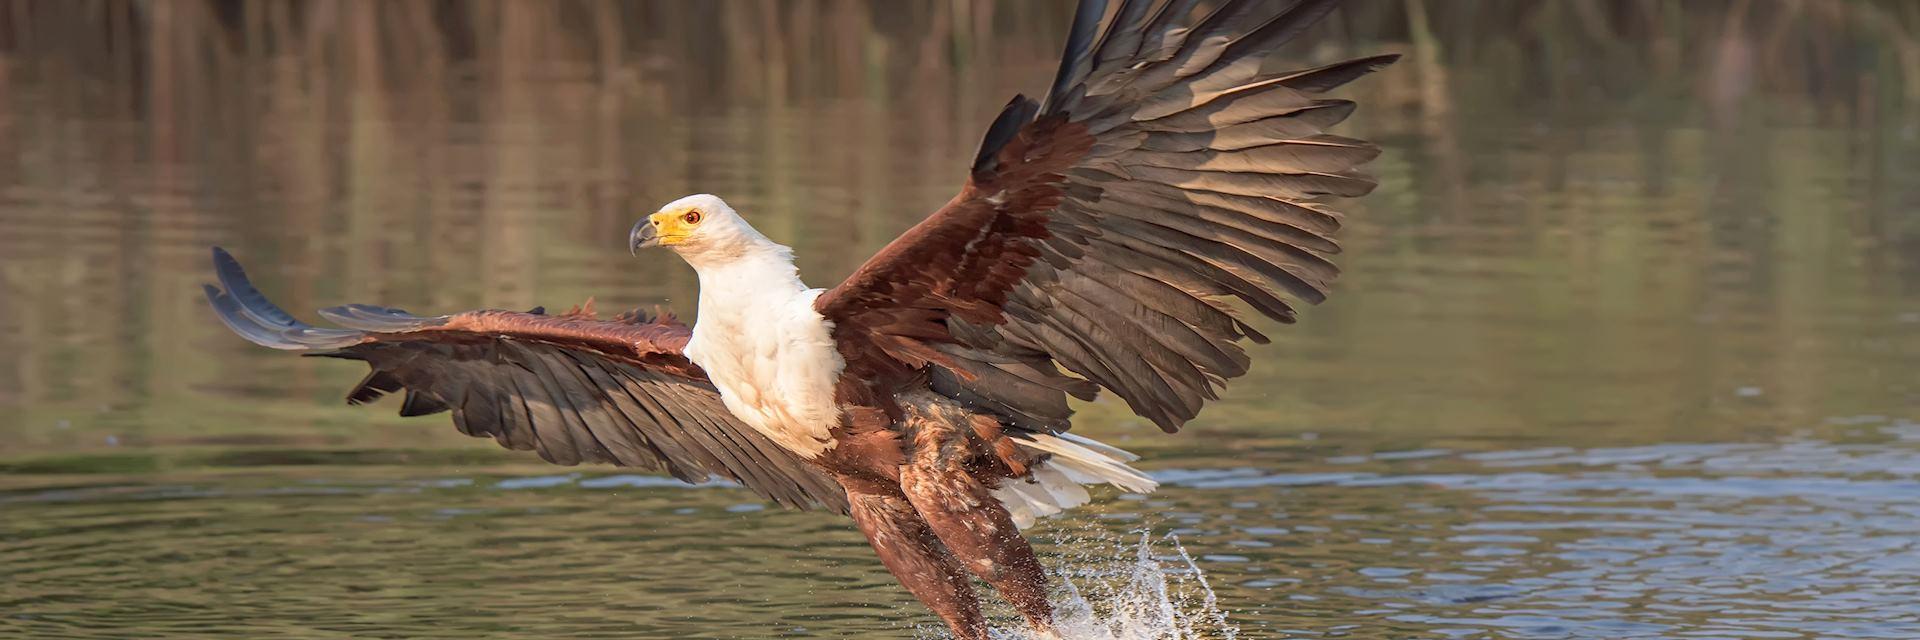 Fish eagle on the Okavango River